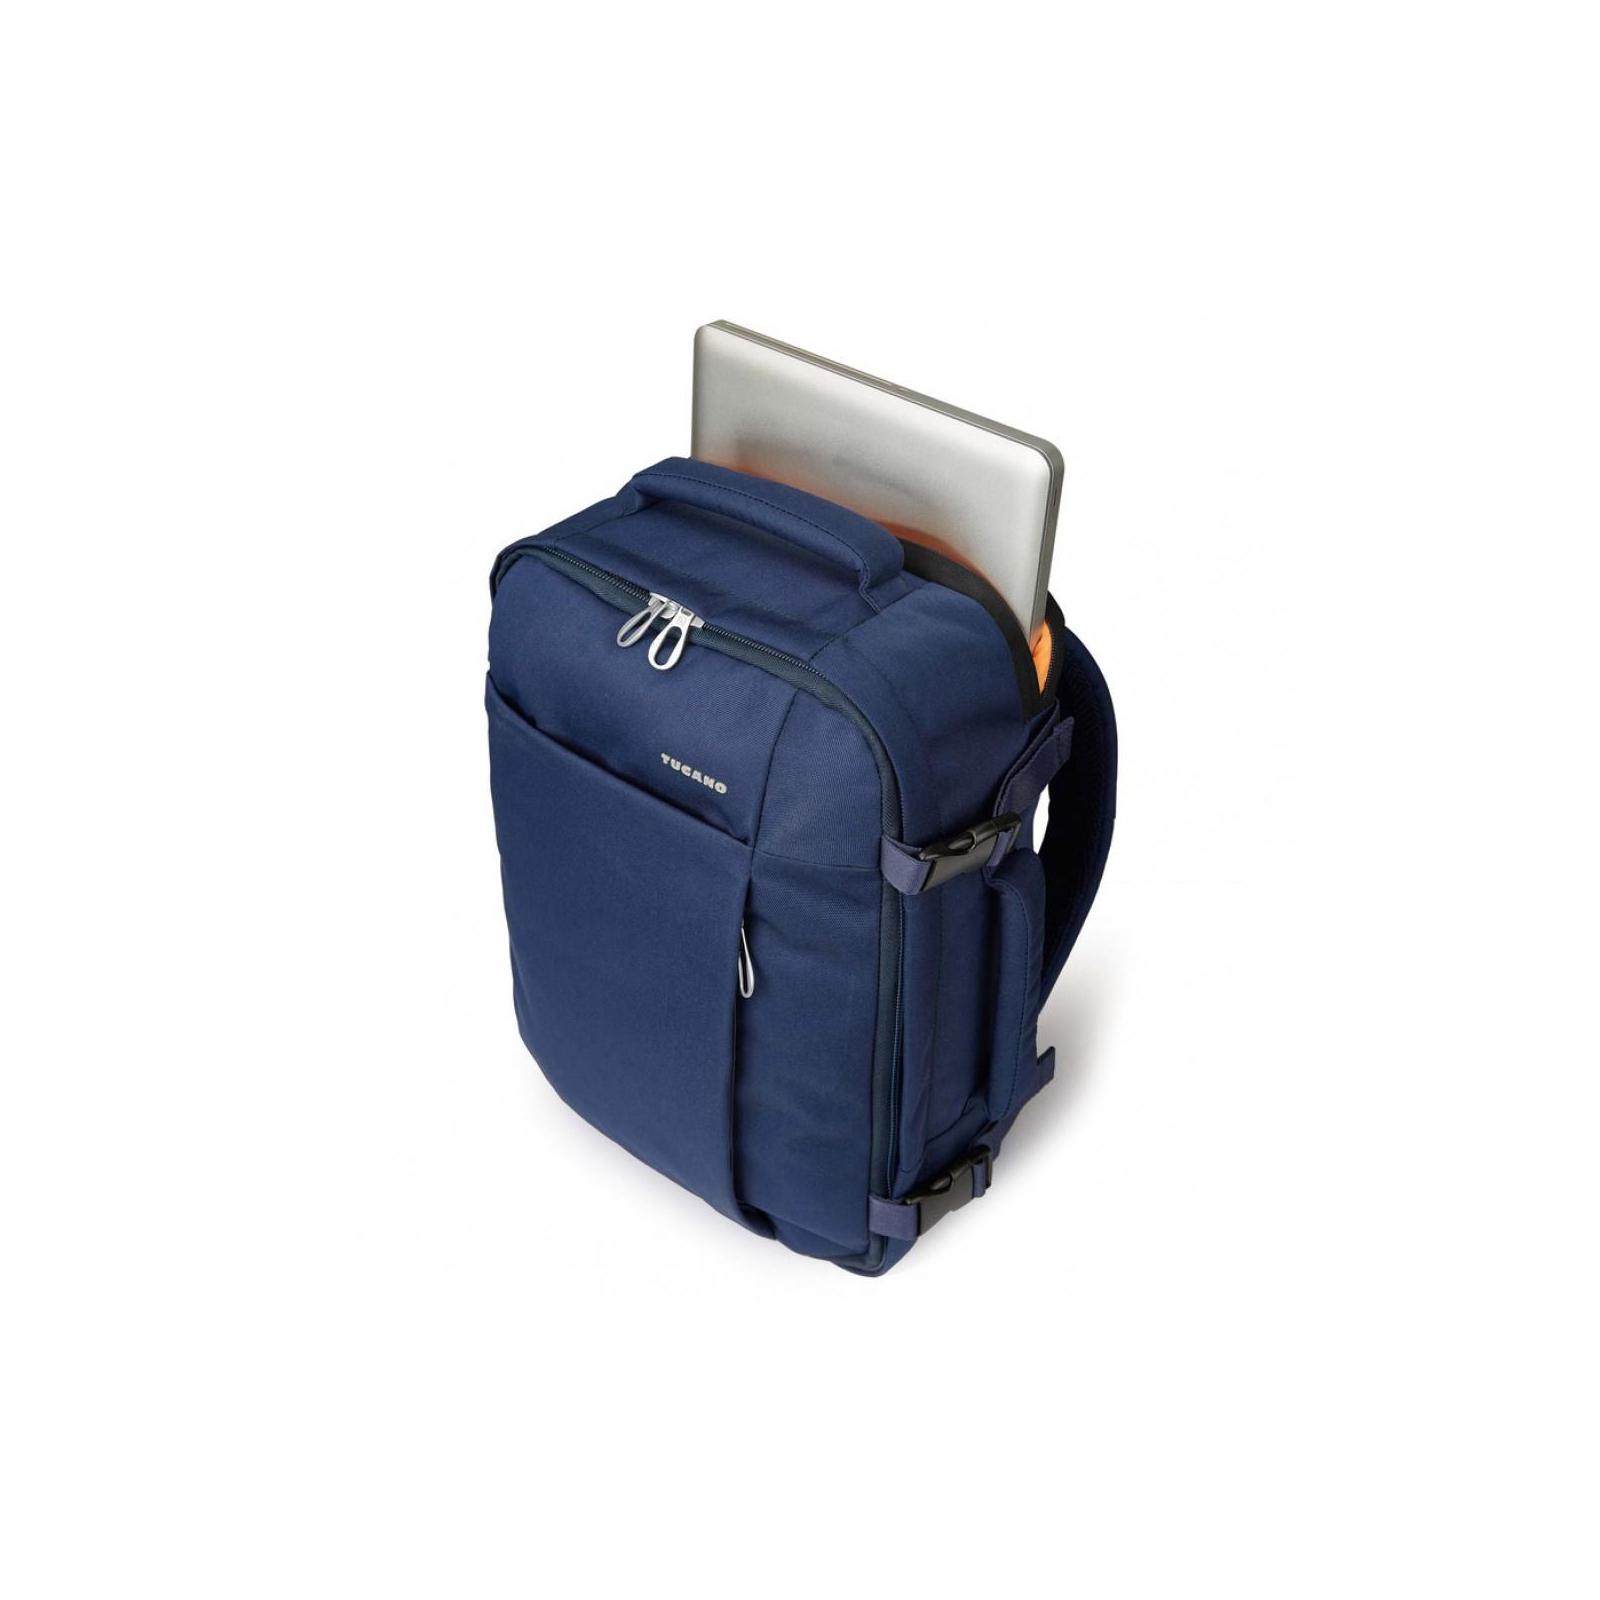 "Рюкзак для ноутбука Tucano 15.6"" TUGO' M CABIN blue (BKTUG-M-B) изображение 4"